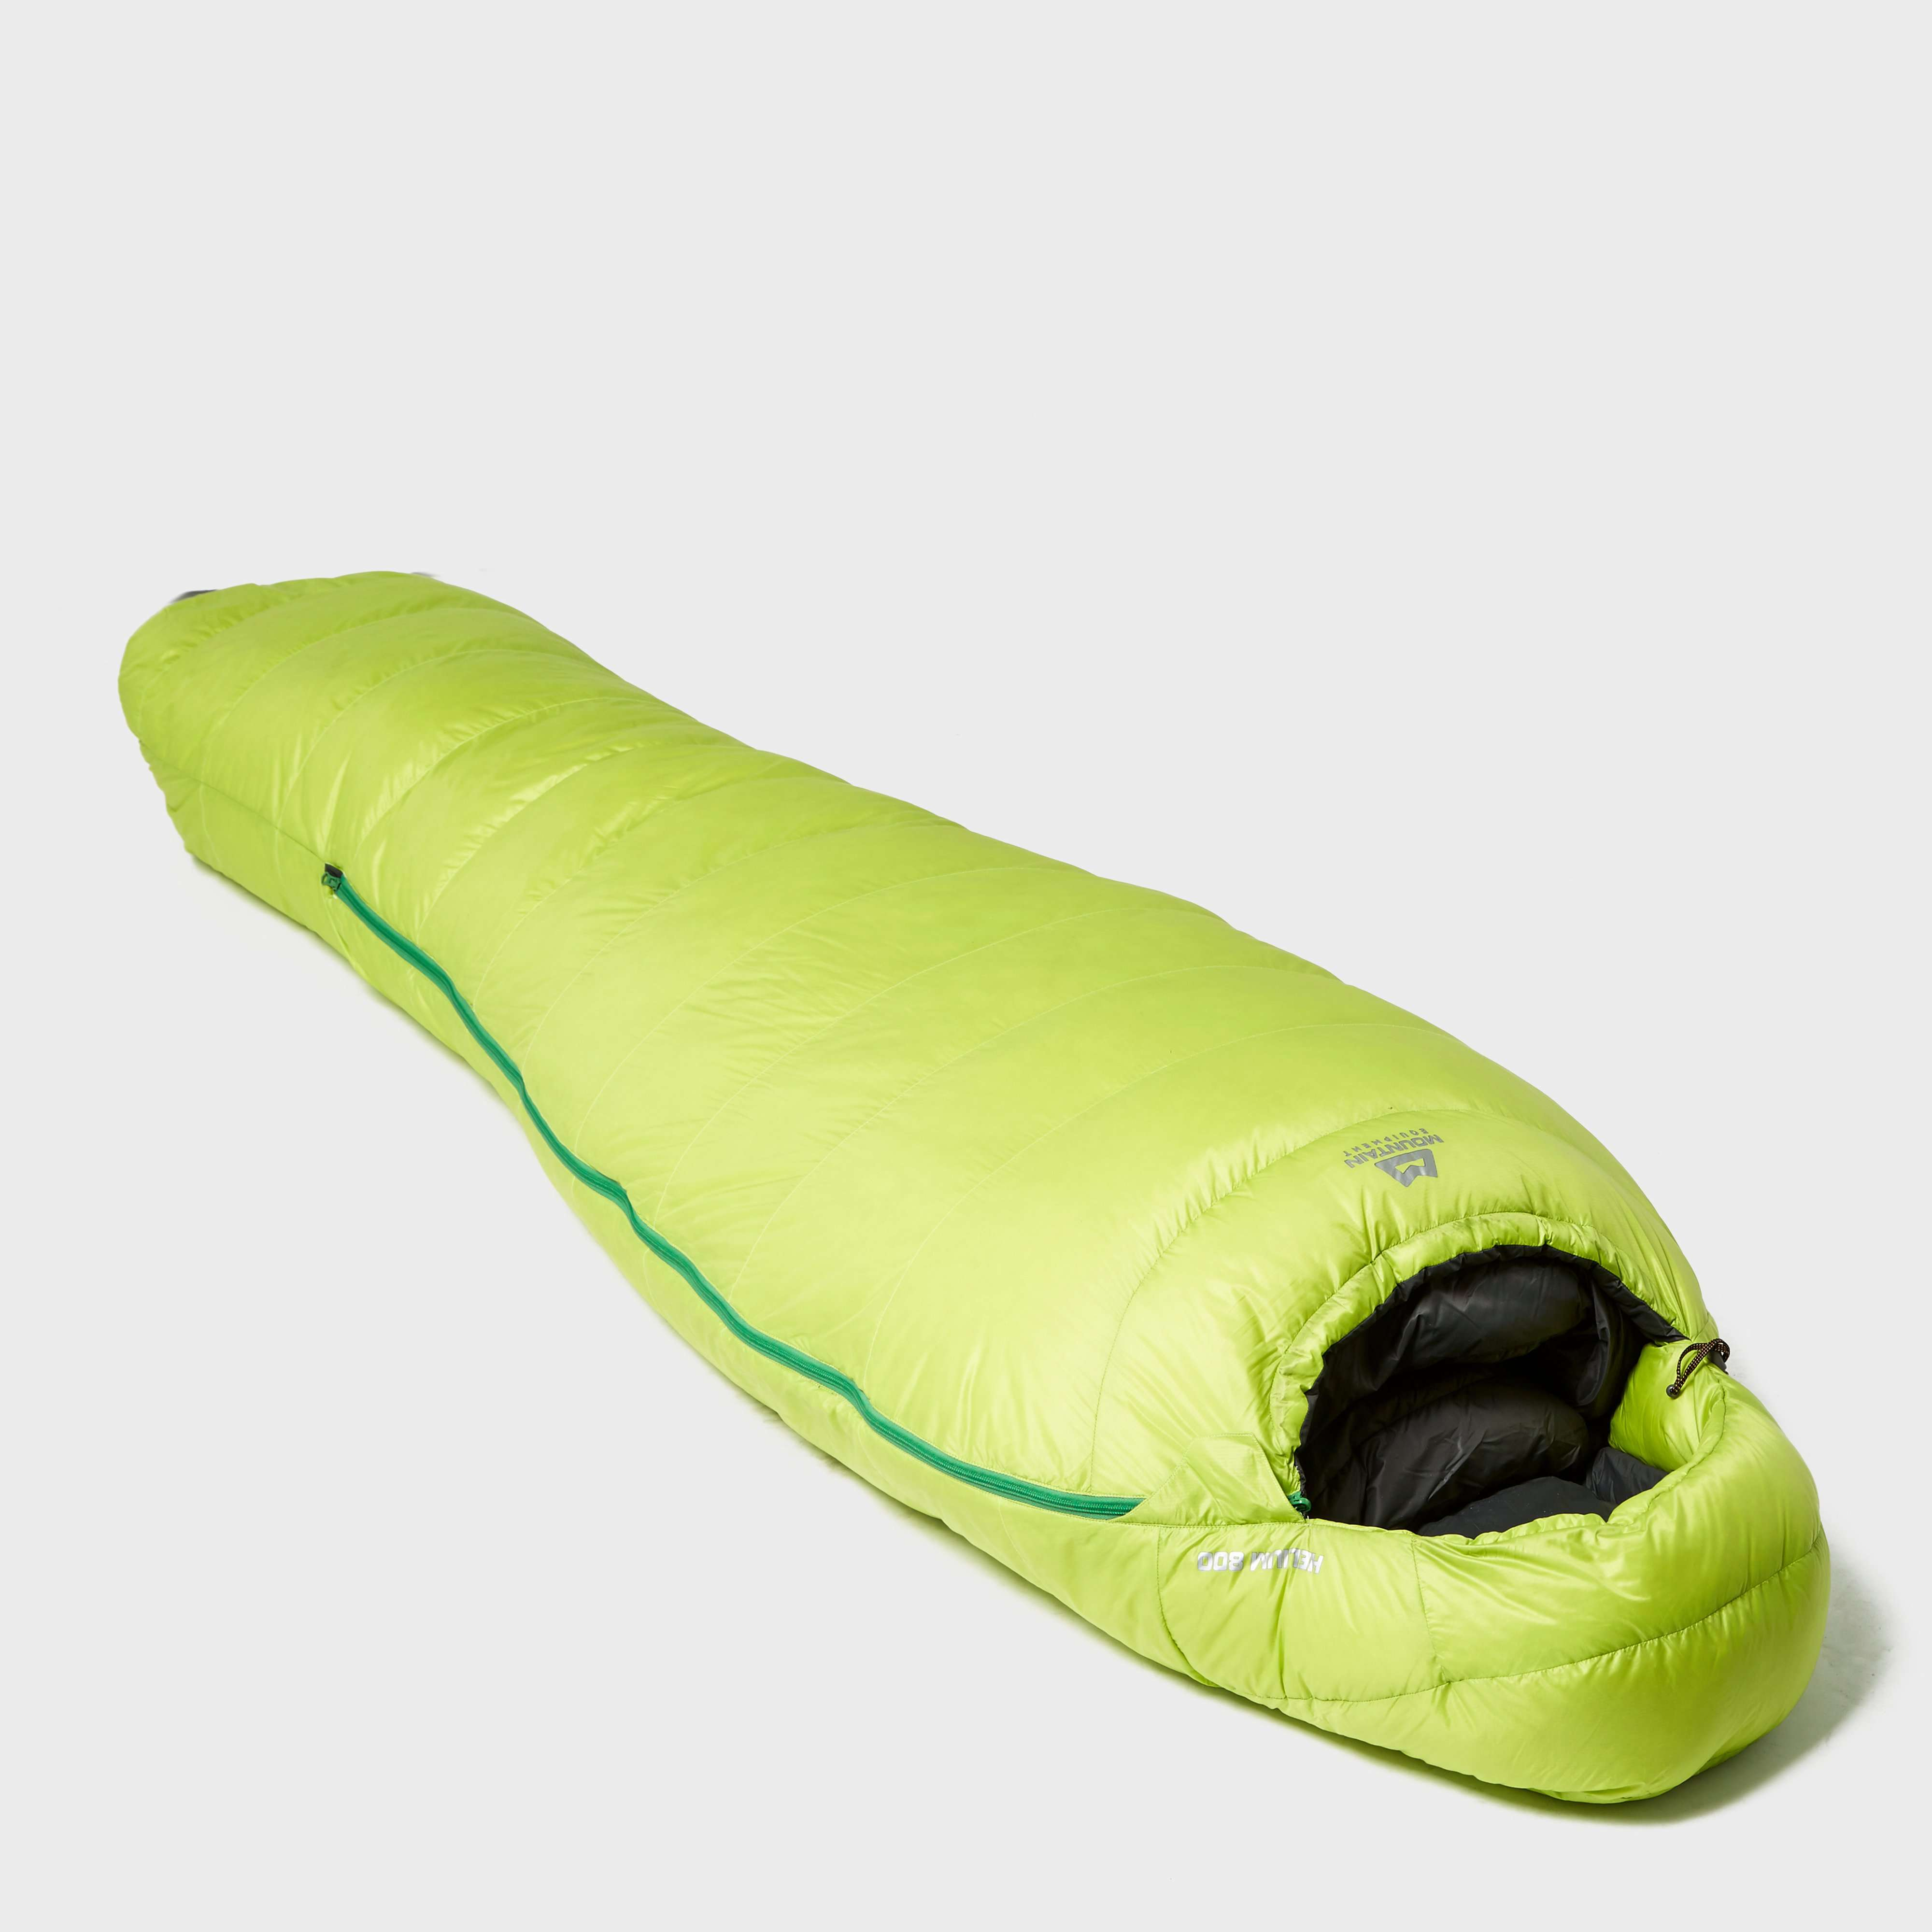 MOUNTAIN EQUIPMENT Helium 800 Sleeping Bag